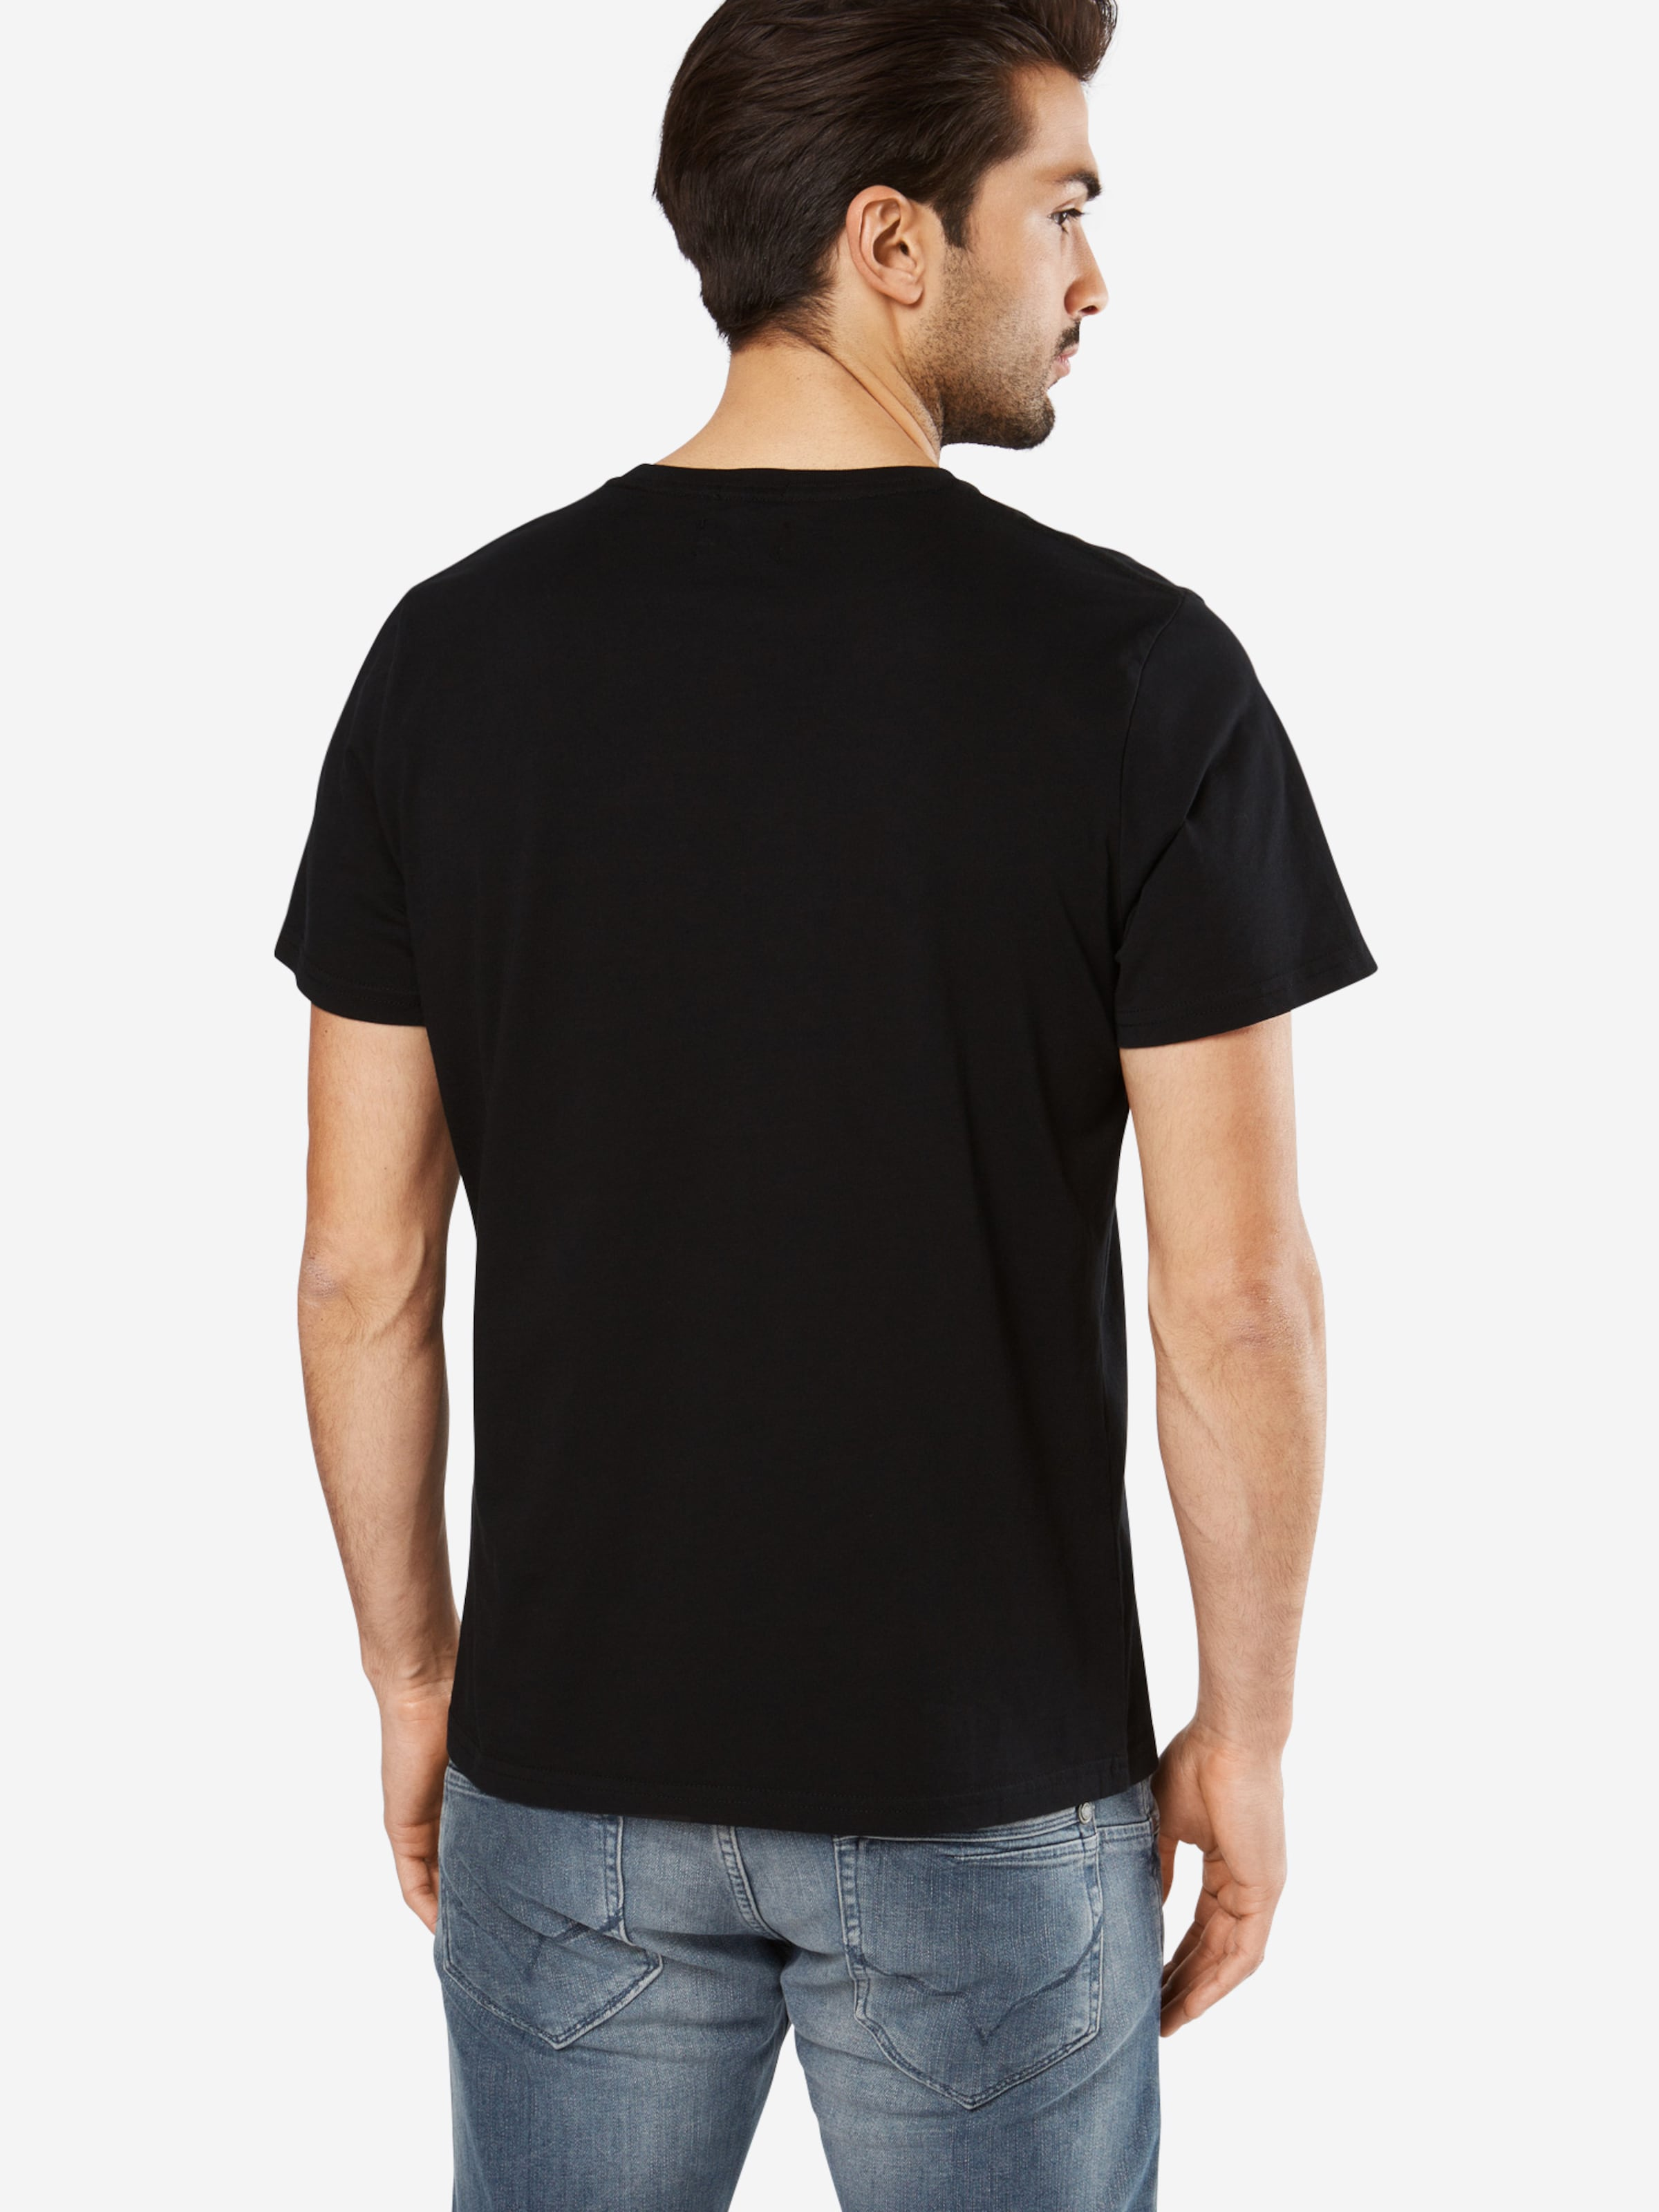 Pepe Jeans T NoirBlanc 'eggo' En shirt qzMSUVp